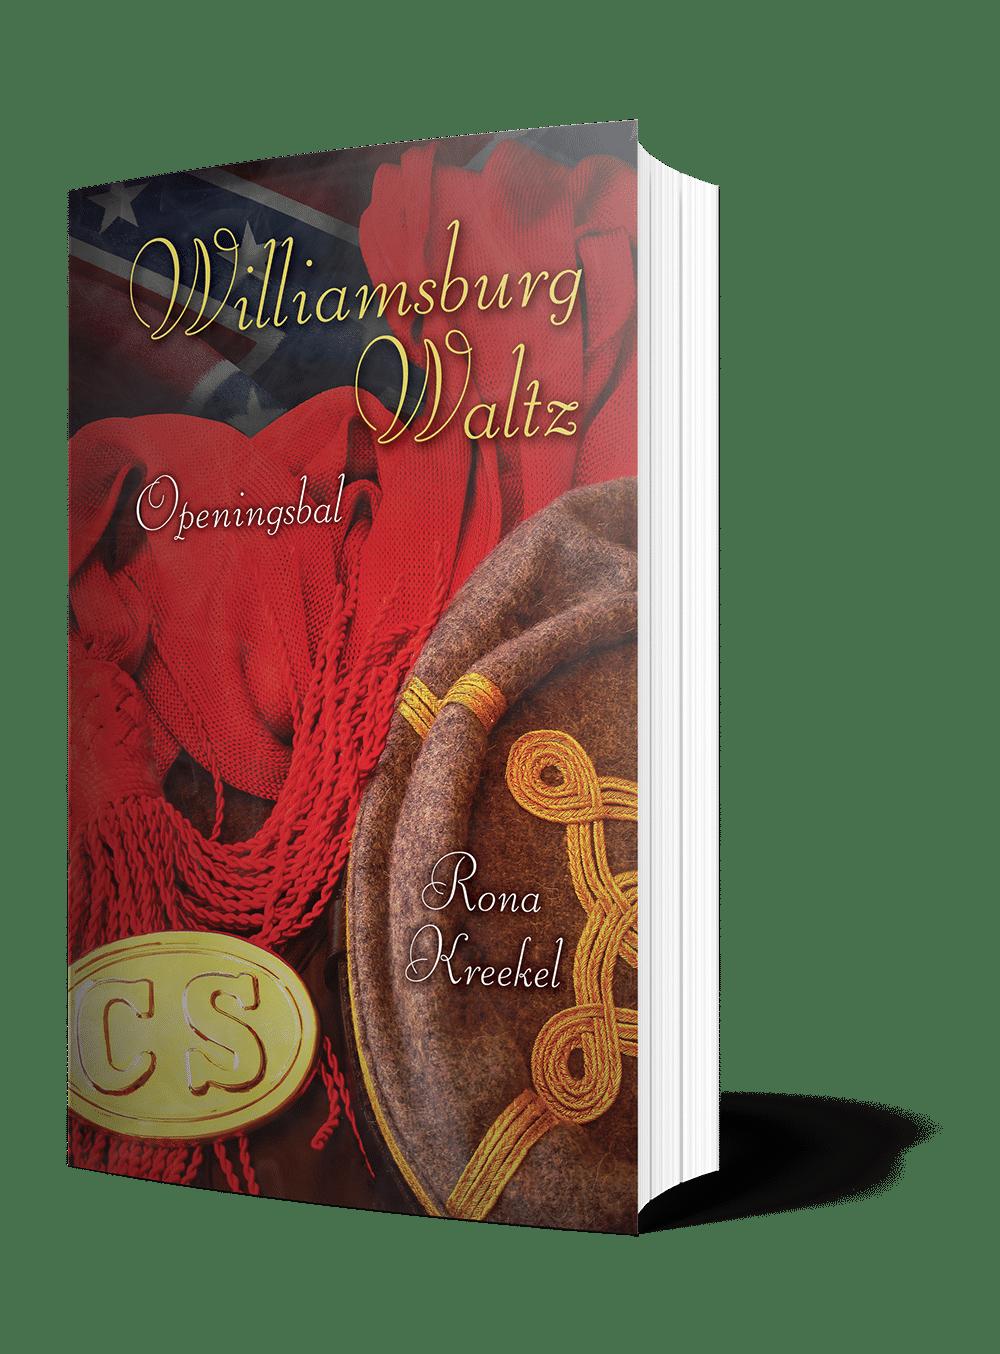 Williamsburg Waltz - Openingsbal